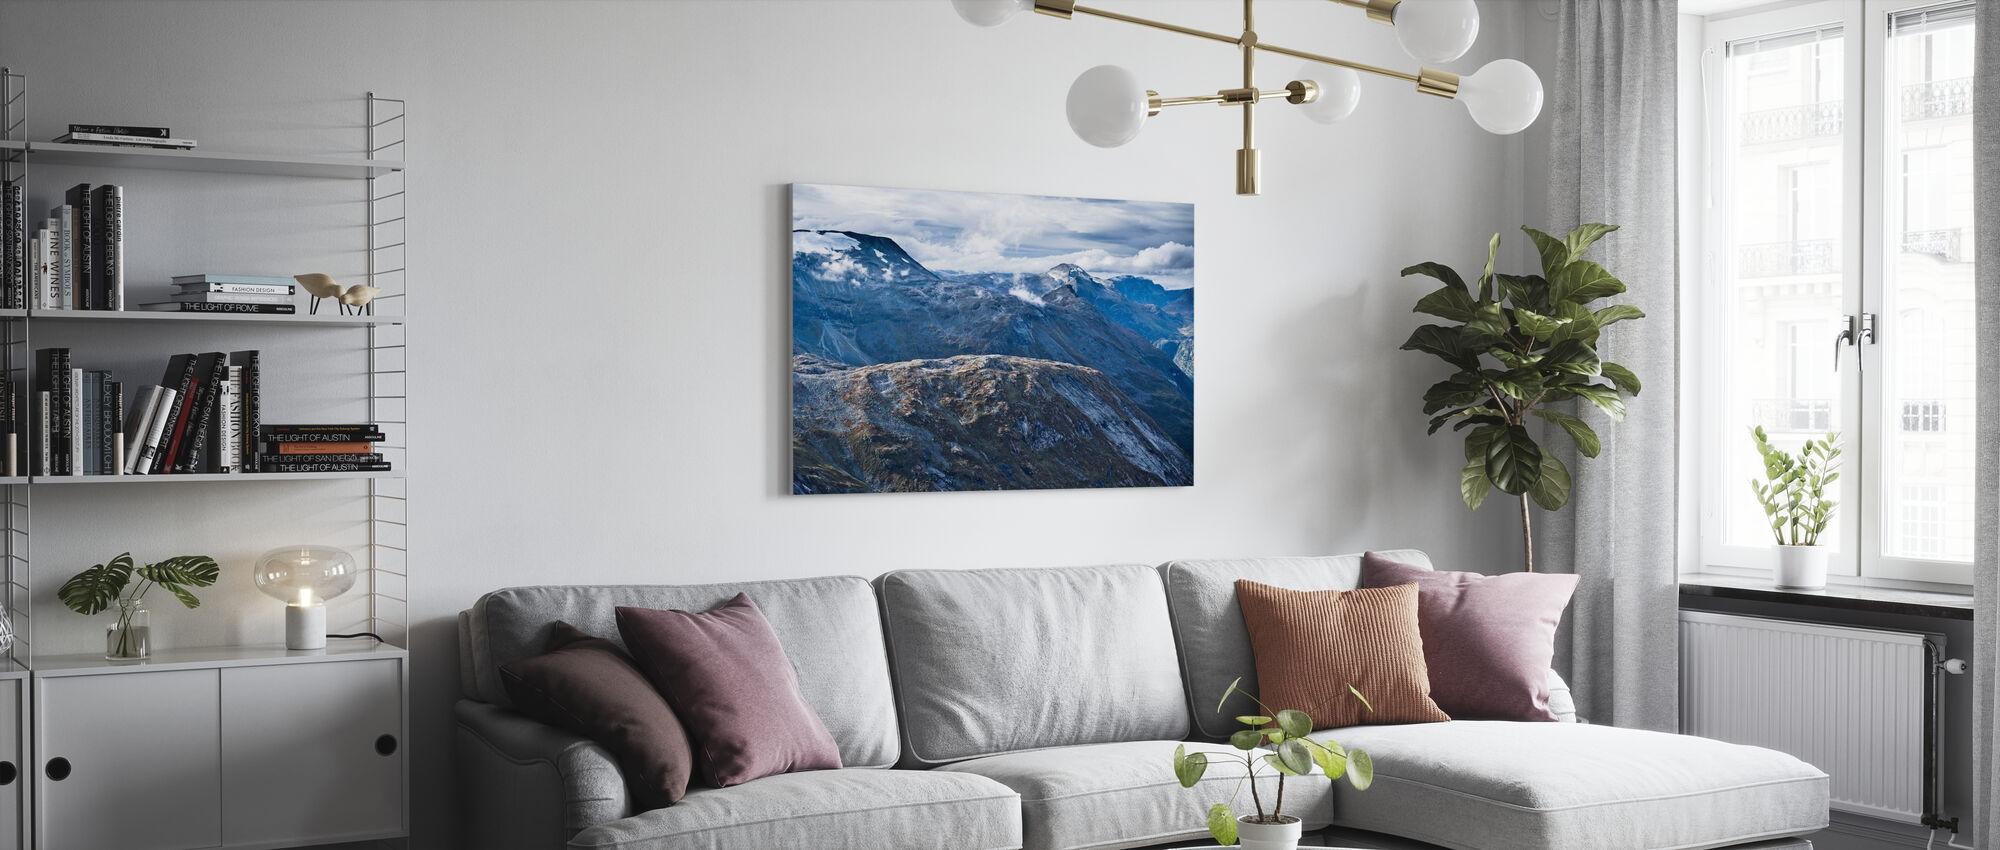 Norsk Fjelllandskap - Lerretsbilde - Stue